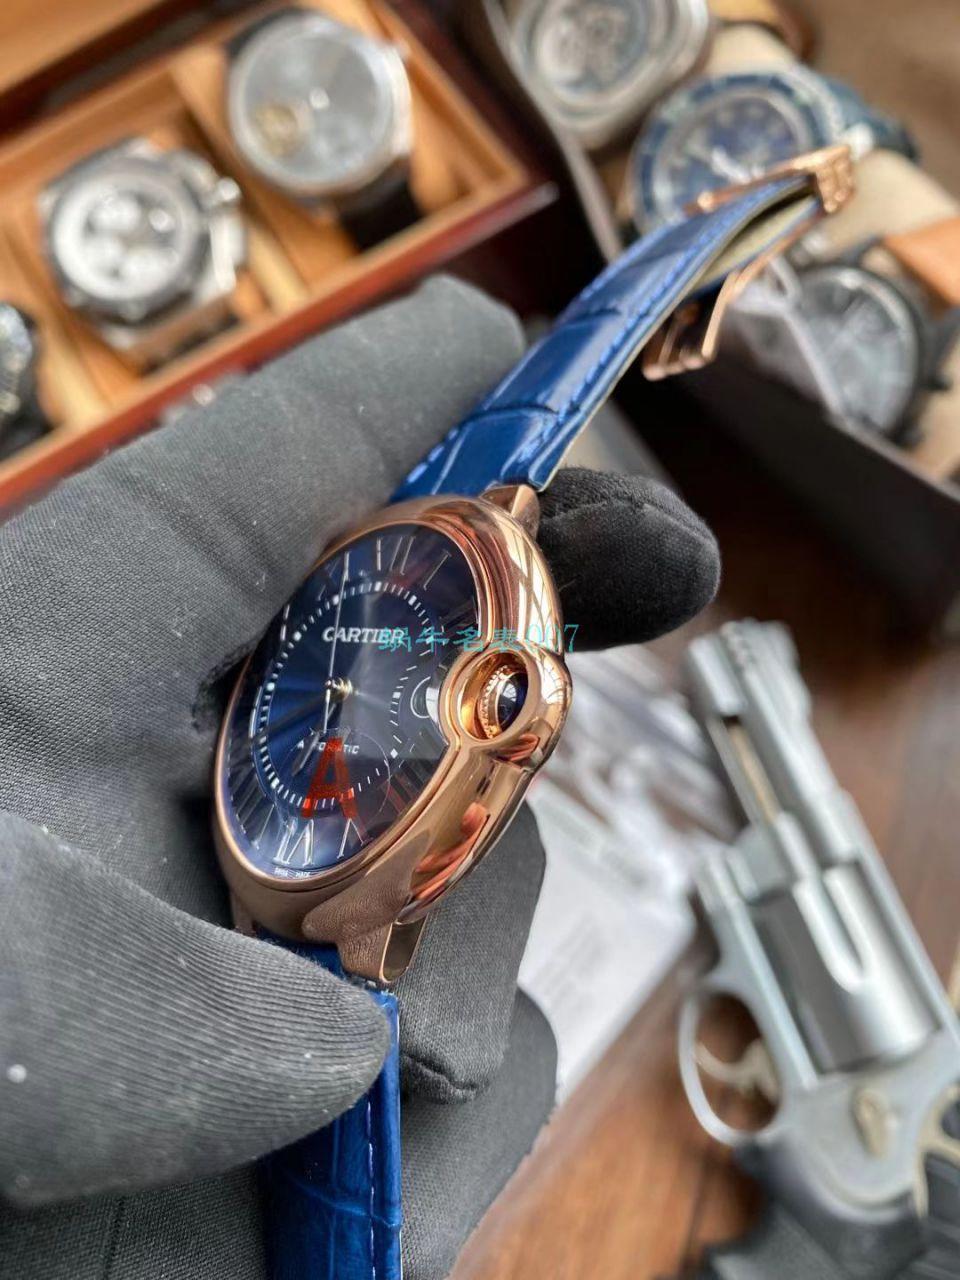 V6厂V8版本卡地亚蓝气球男装一比一超A高仿手表WGBB0036腕表 / K323